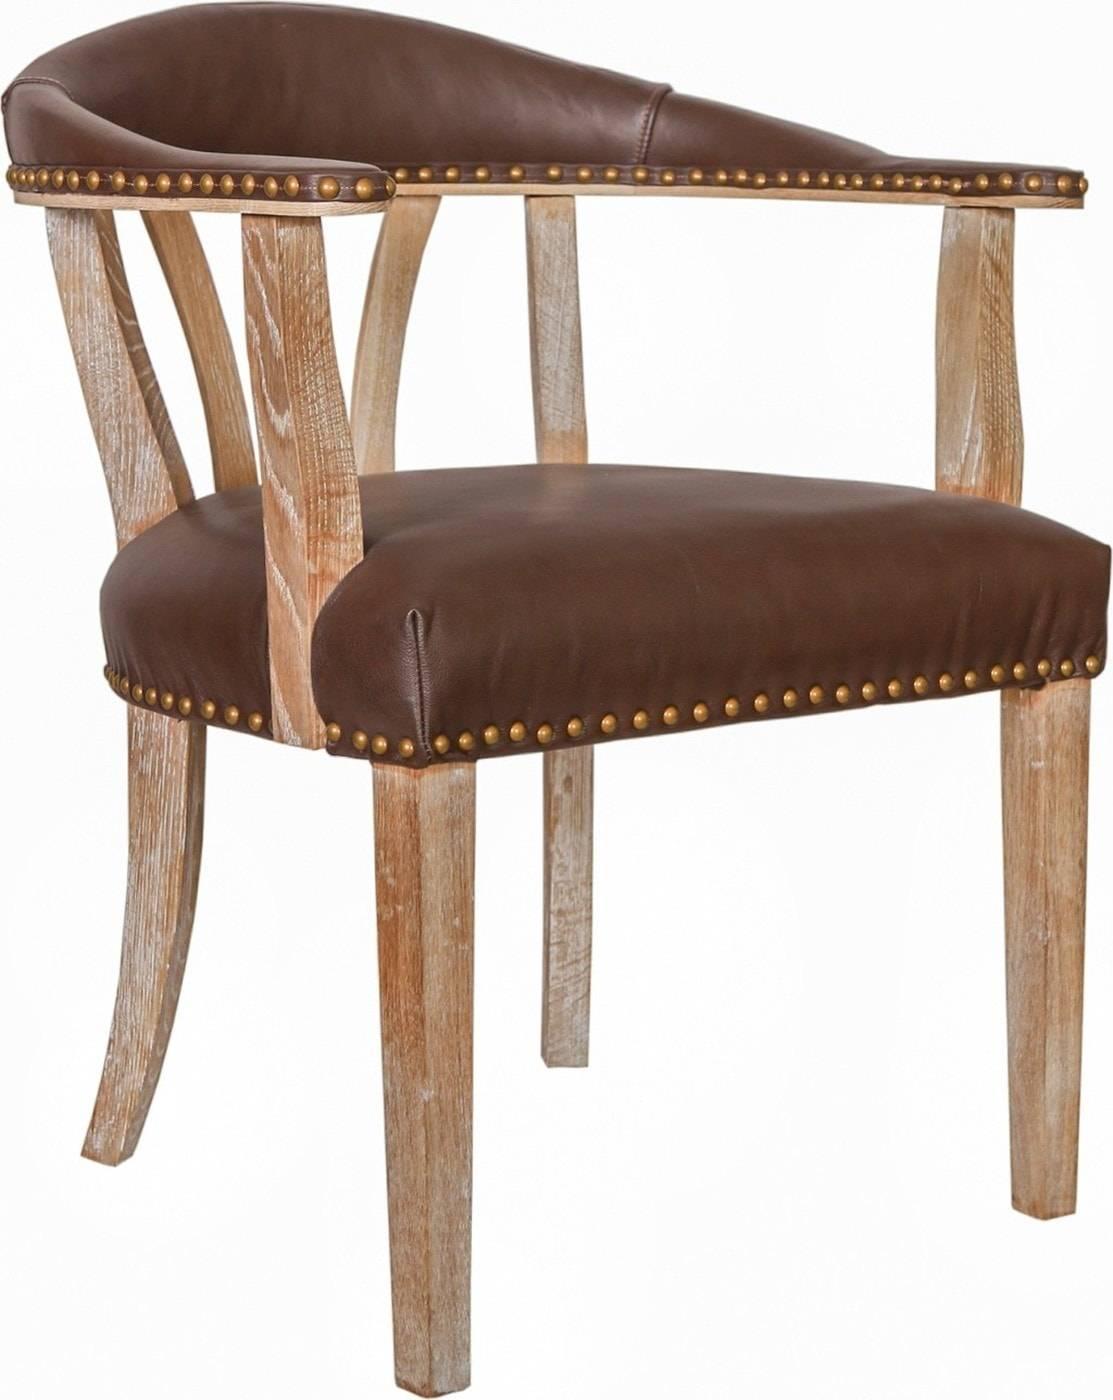 Стул-кресло Tanner leather